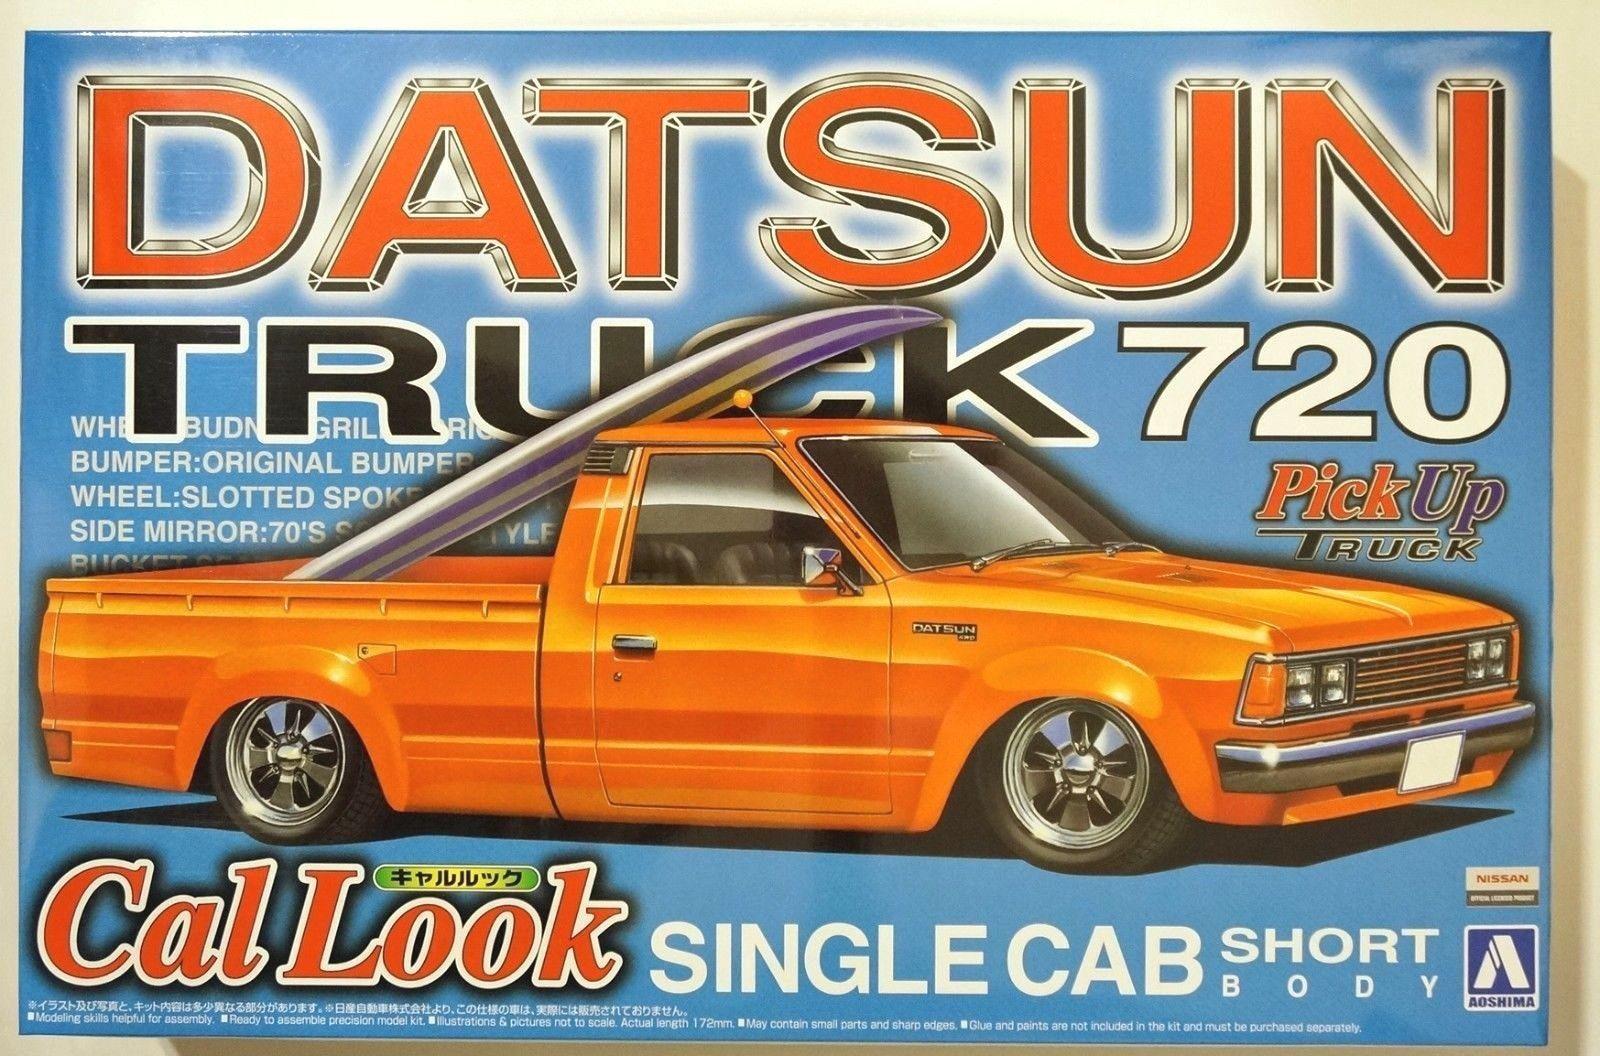 Aoshima pickup truck 4 1 24 datsun truck 720 cal look single cab short body kit